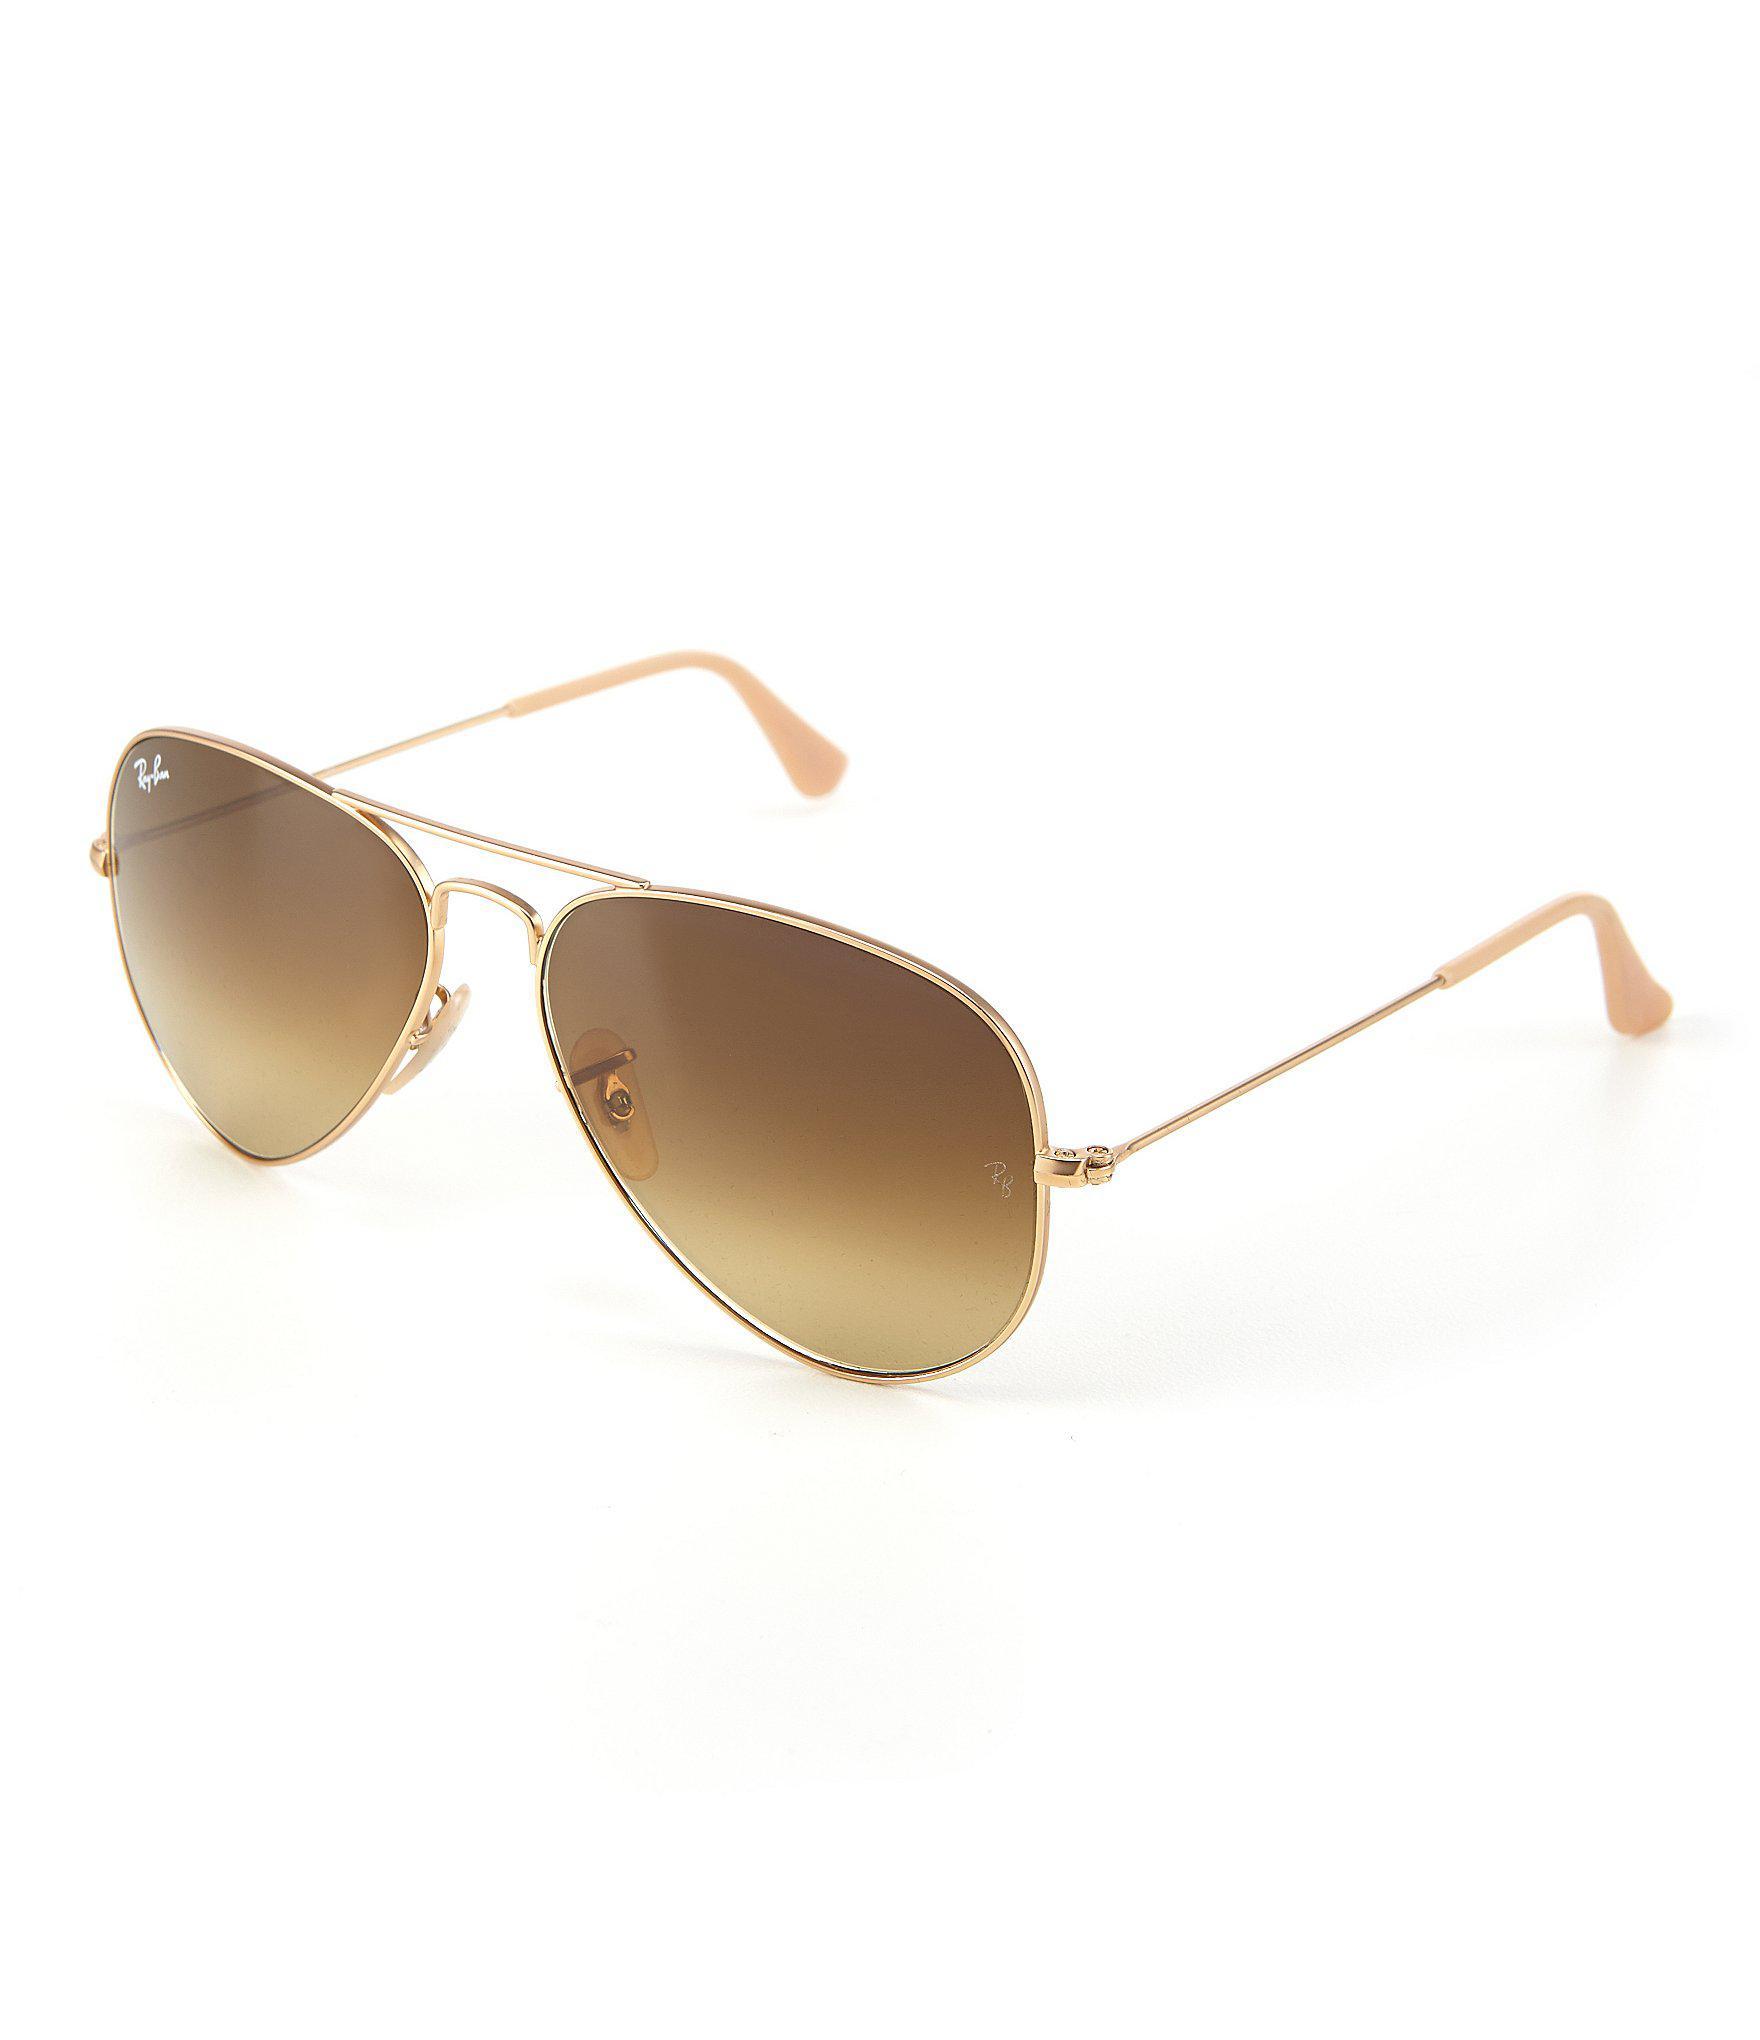 eca2c088fdbe Lyst - Ray-Ban Large Metal Double Bridge Aviator Sunglasses in Black